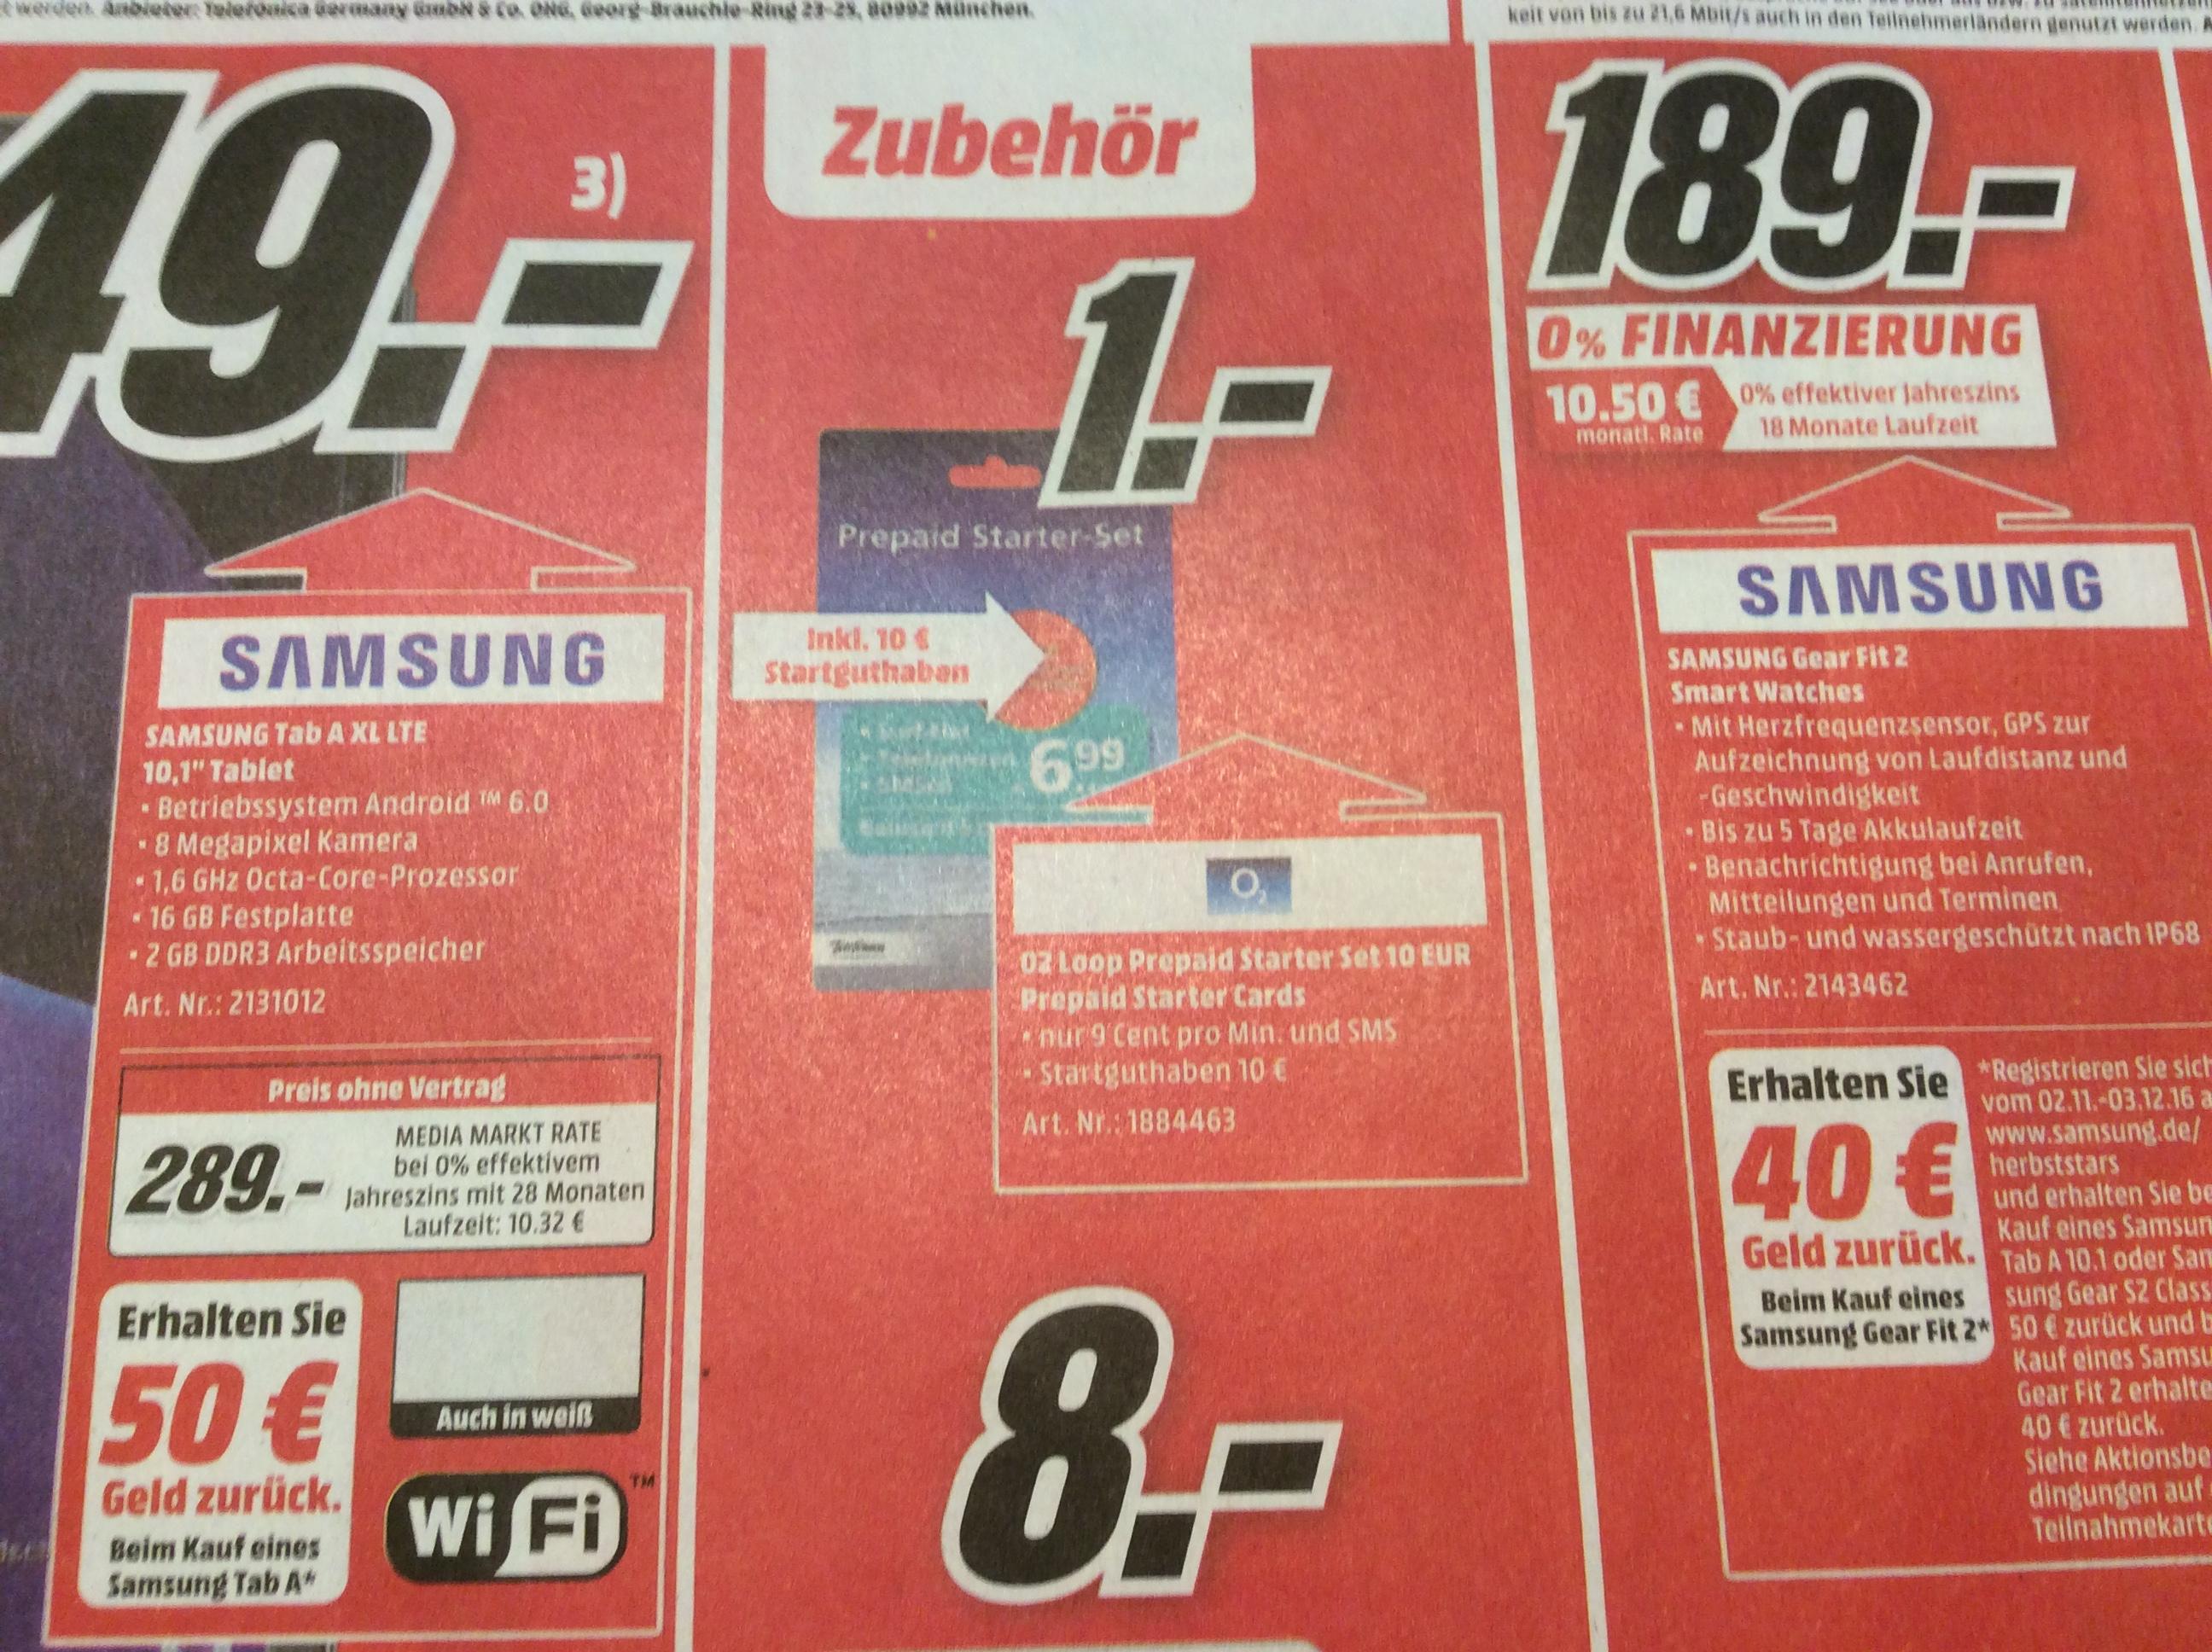 [lokal MM Kaiserslautern] O2 Prepaid Starter-Set inkl. 10€ Startguthaben für 1€